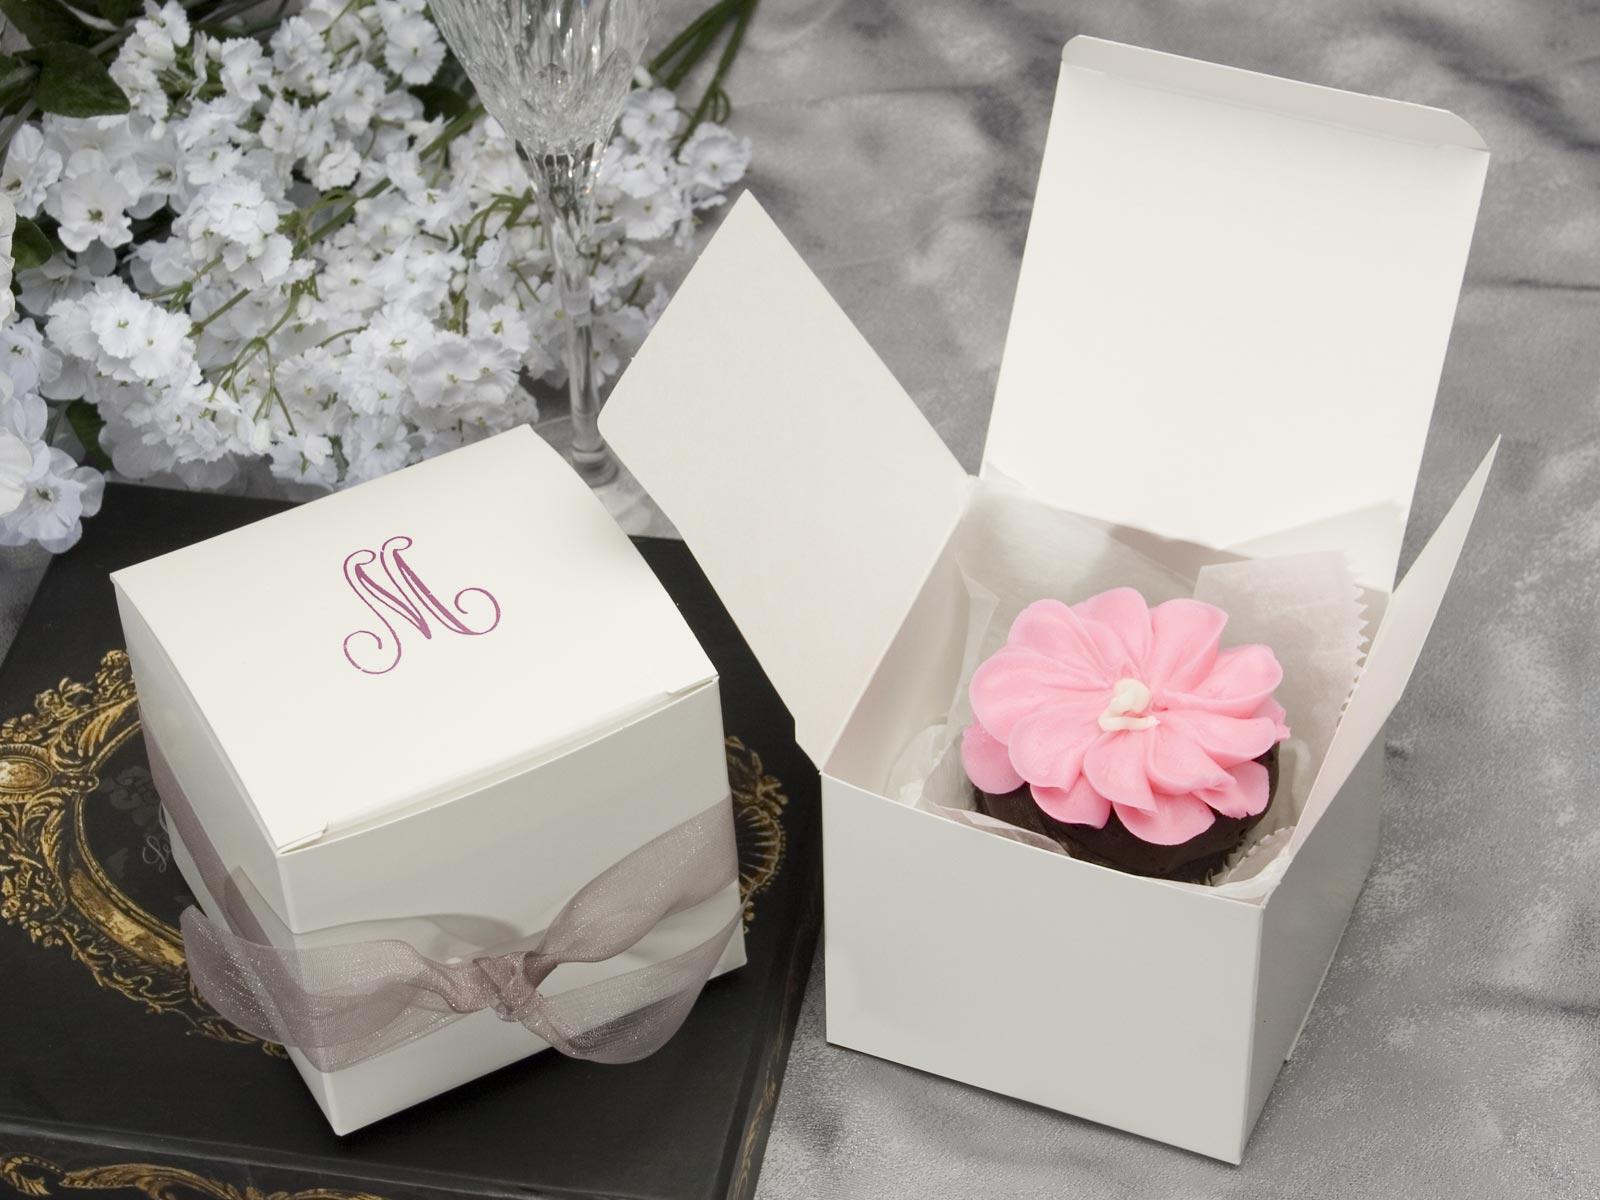 Box For Cakes - Ivoiregion